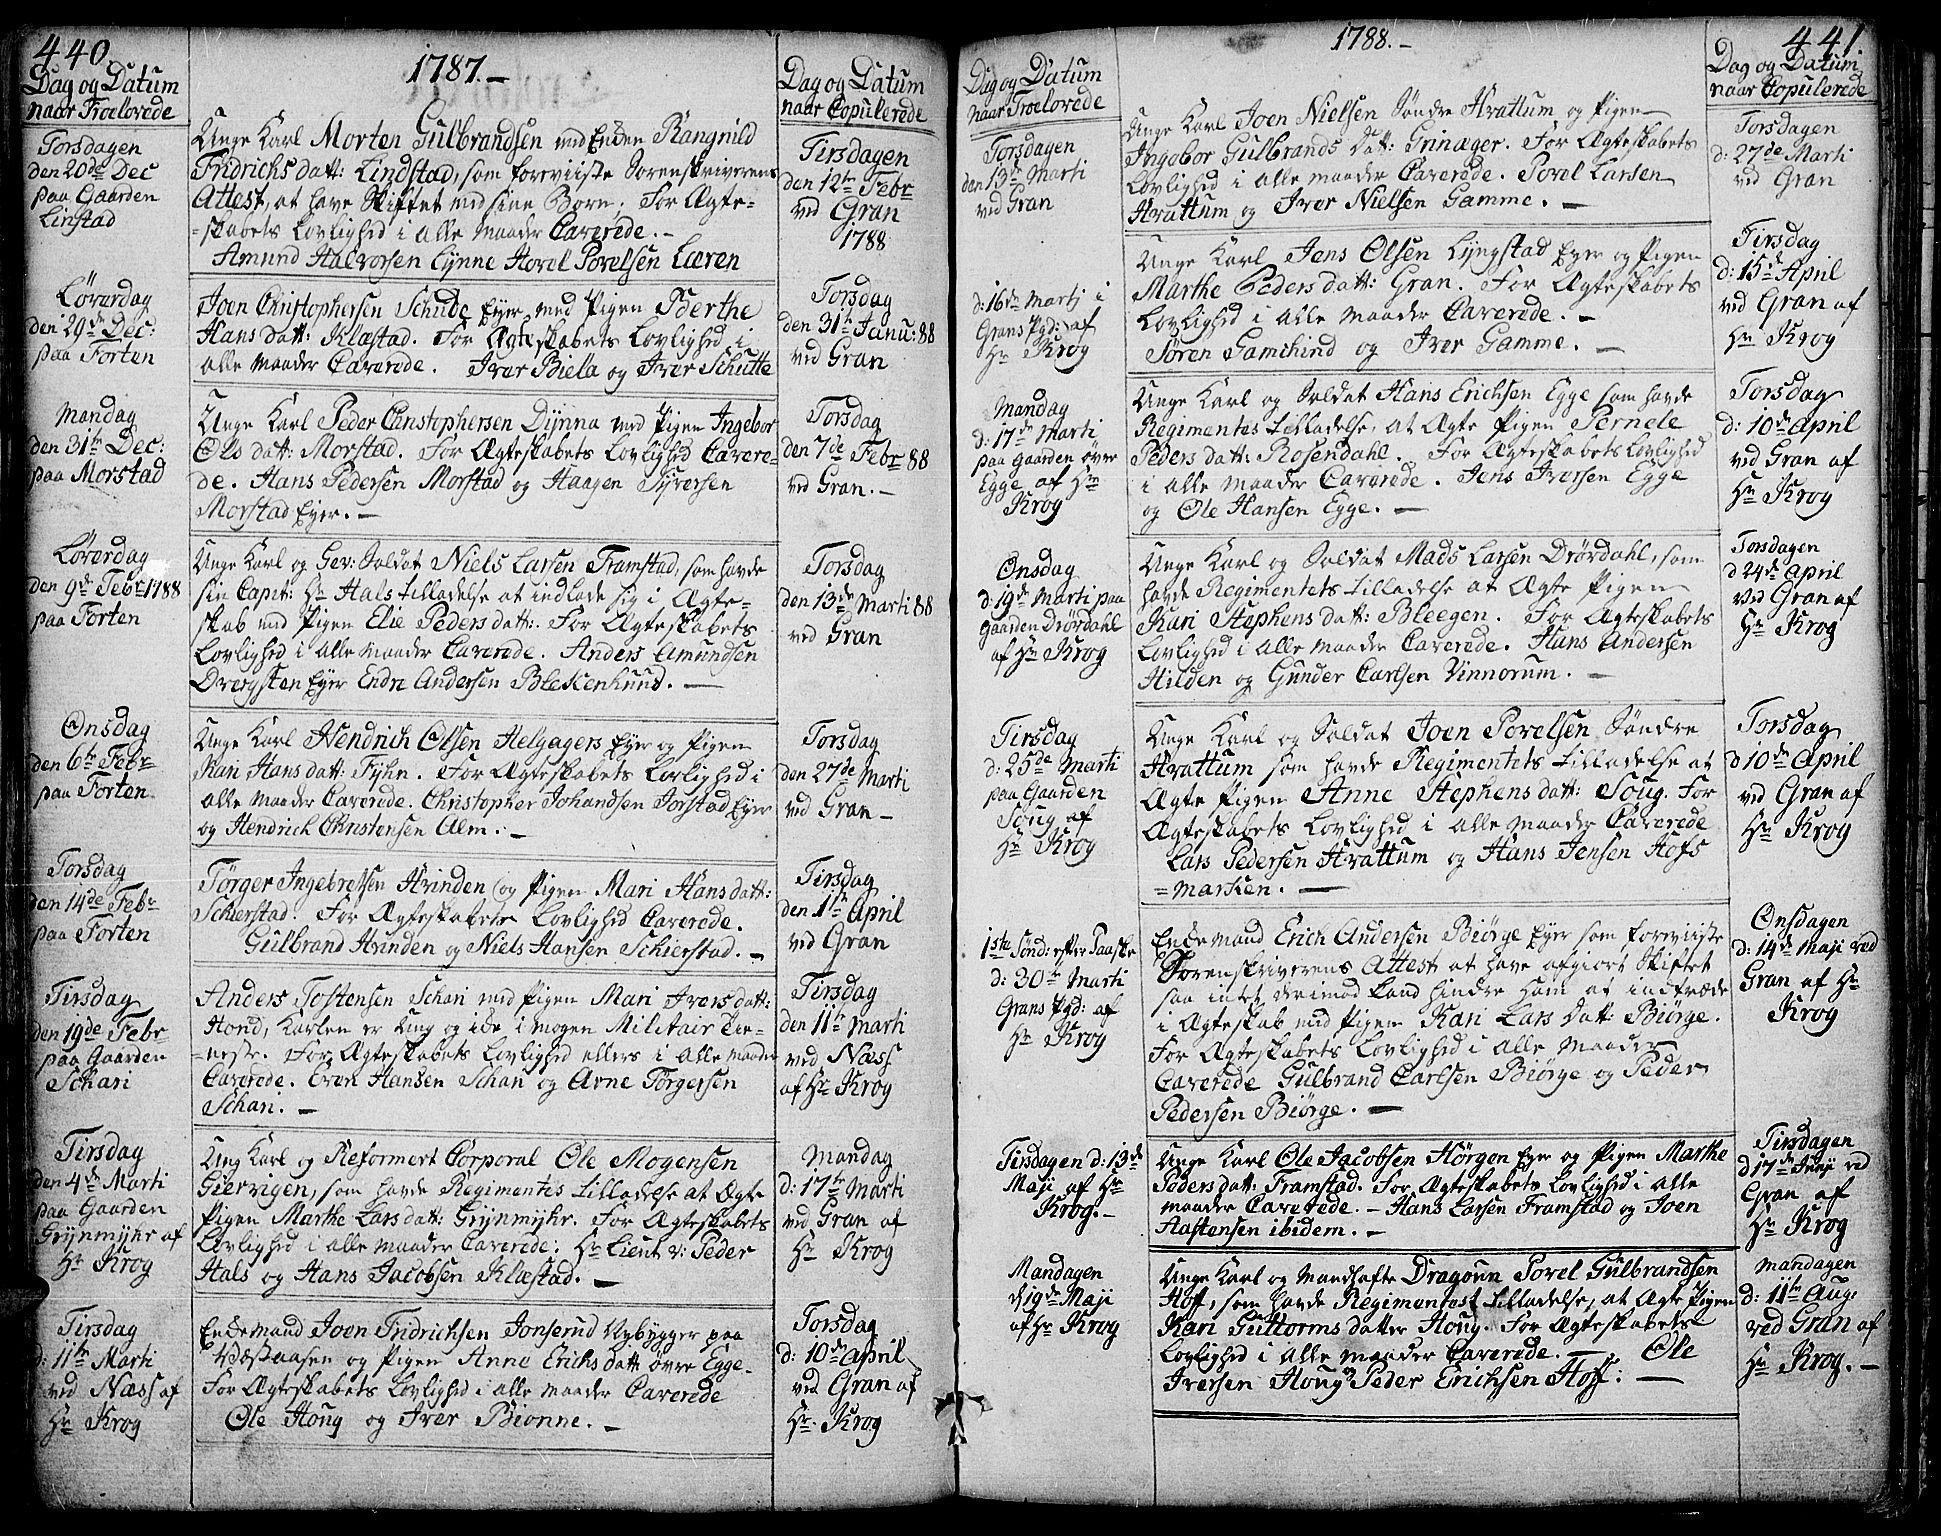 SAH, Gran prestekontor, Ministerialbok nr. 6, 1787-1824, s. 440-441